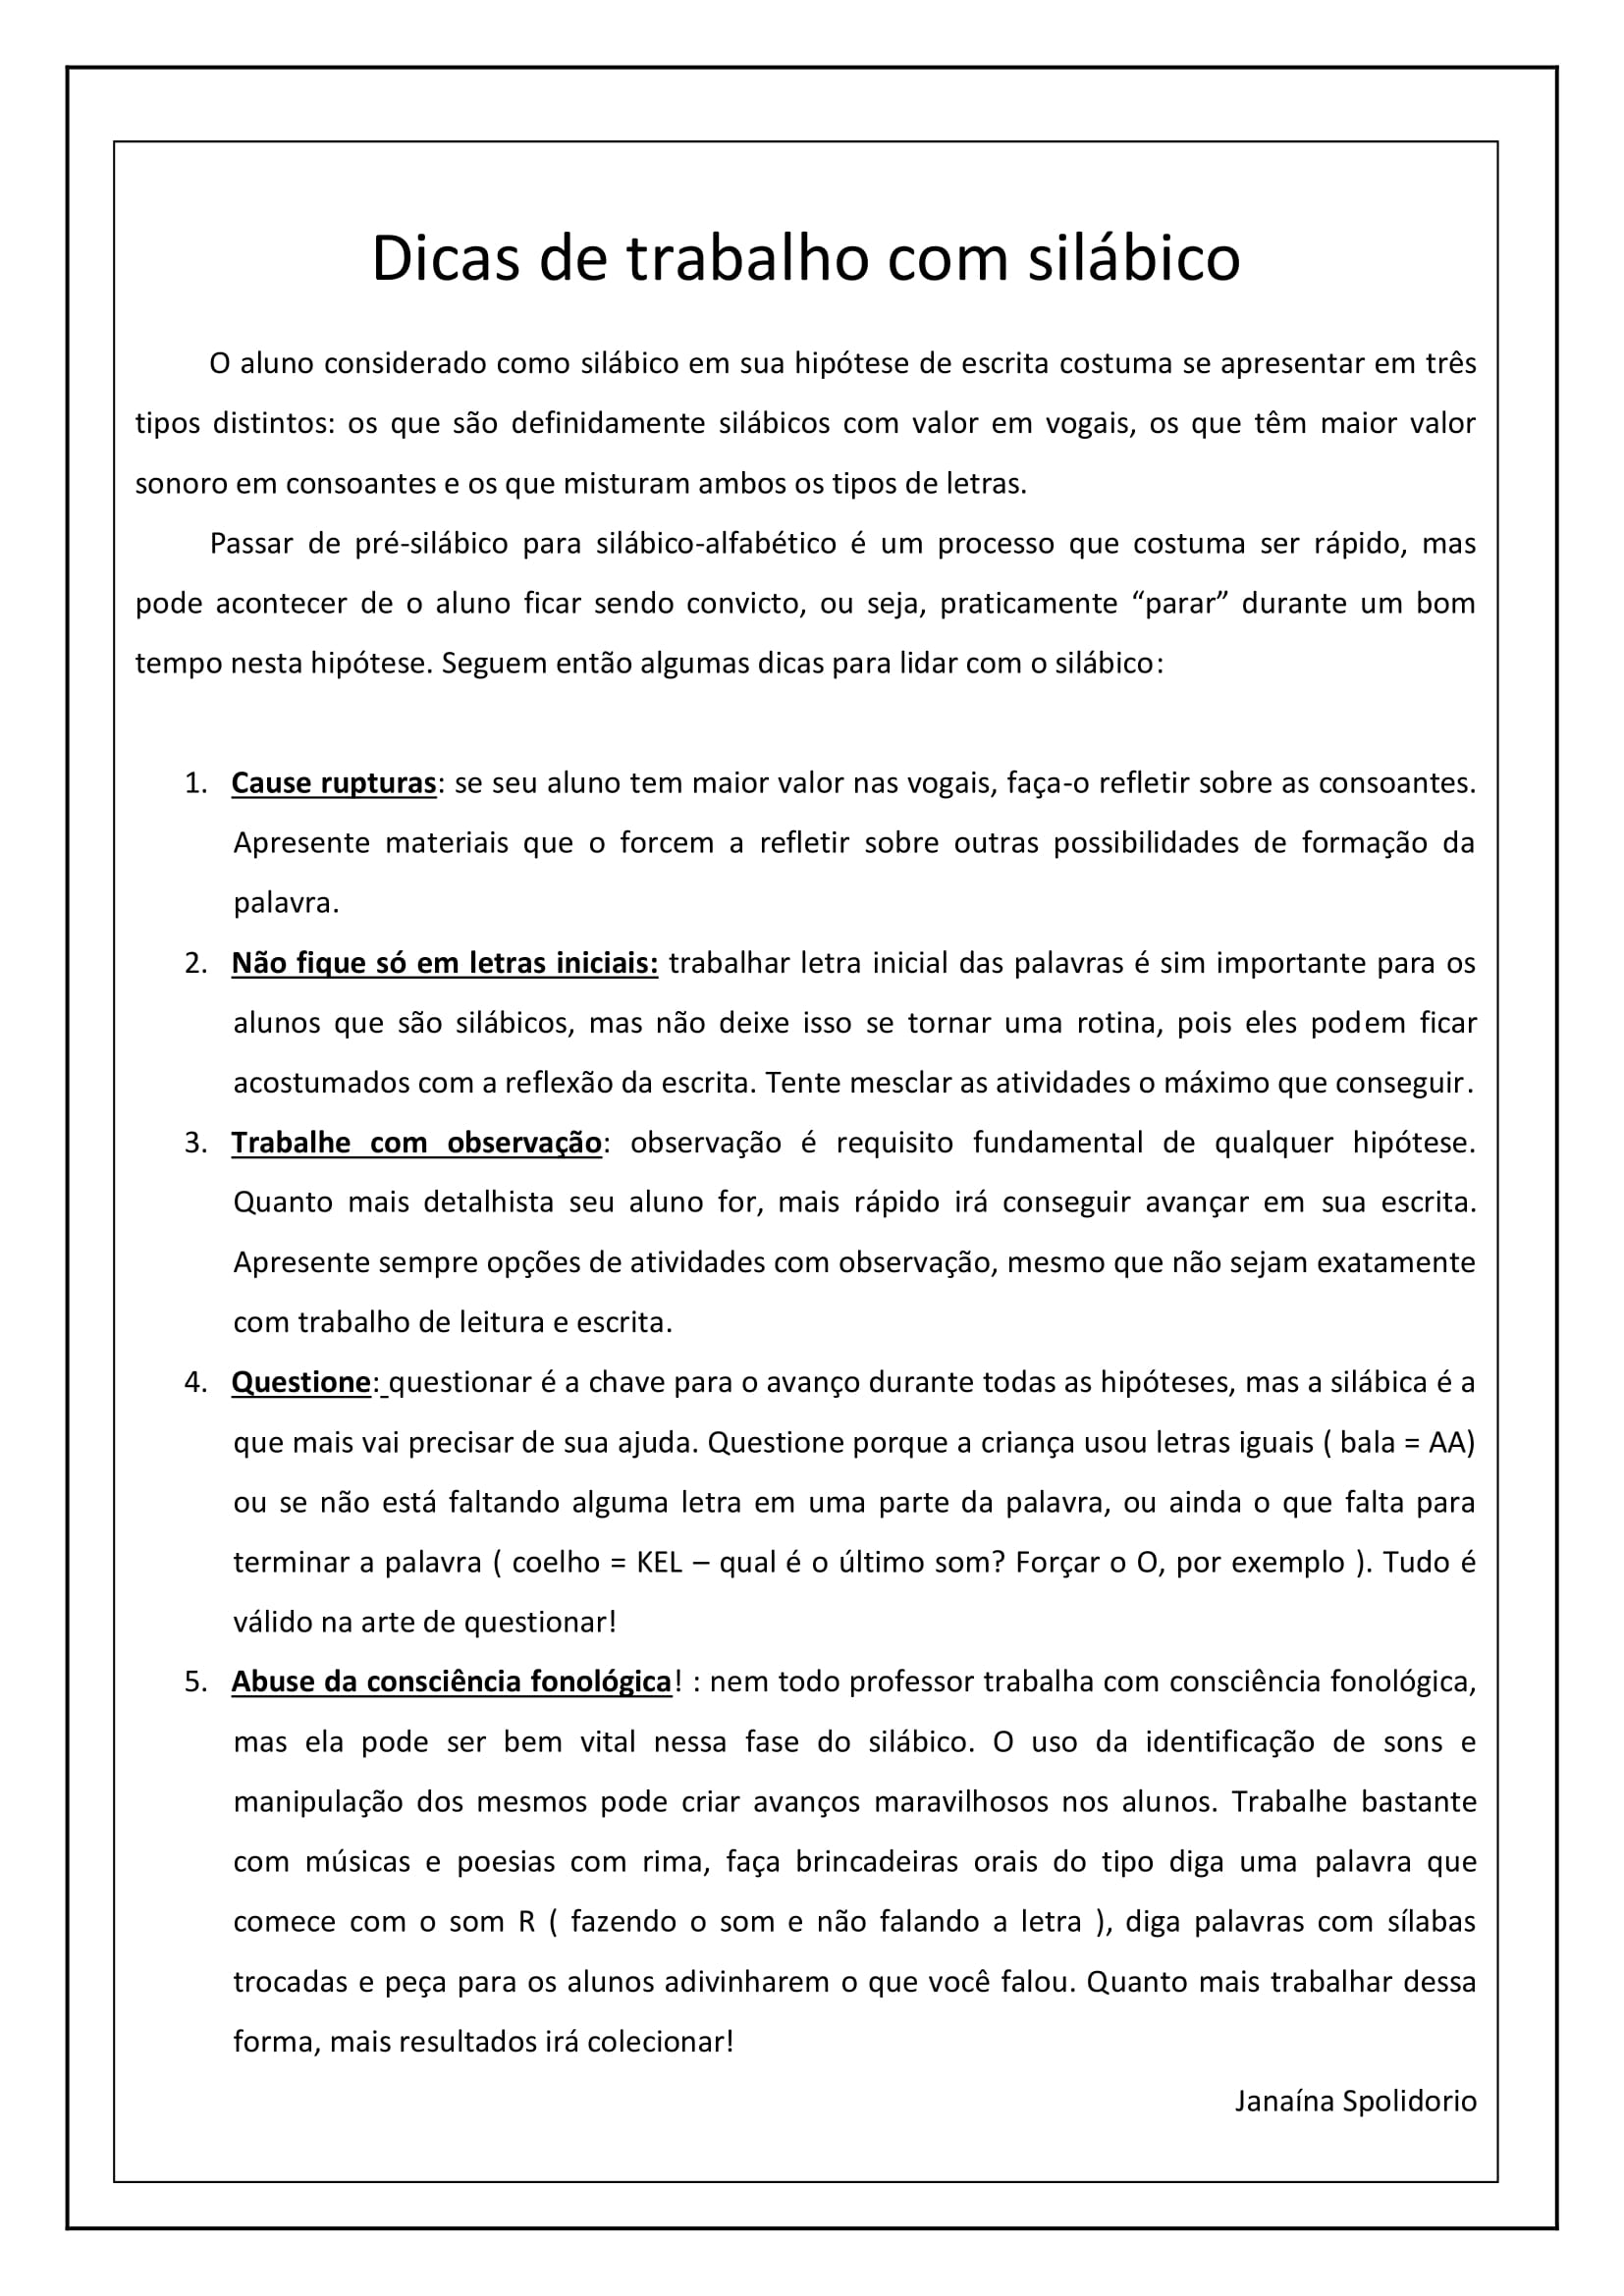 Imprimir_atividades_para_silabicos-02